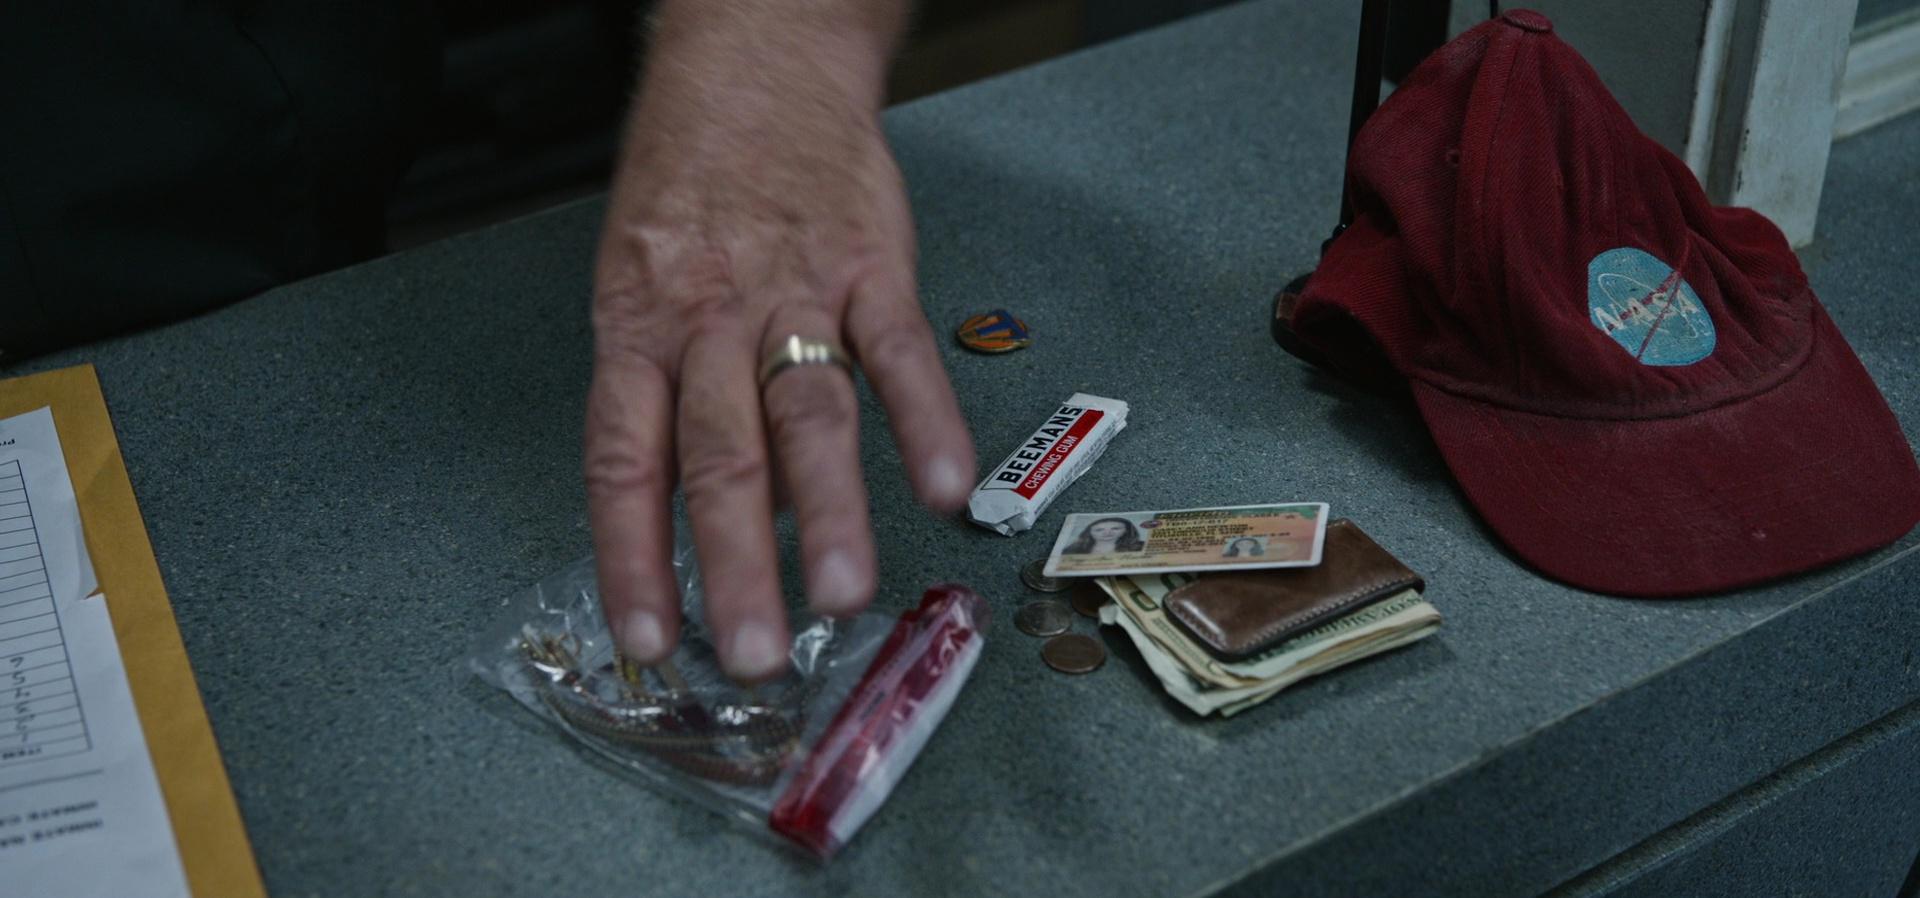 Beemans Chewing Gum In Tomorrowland 2015 Movie